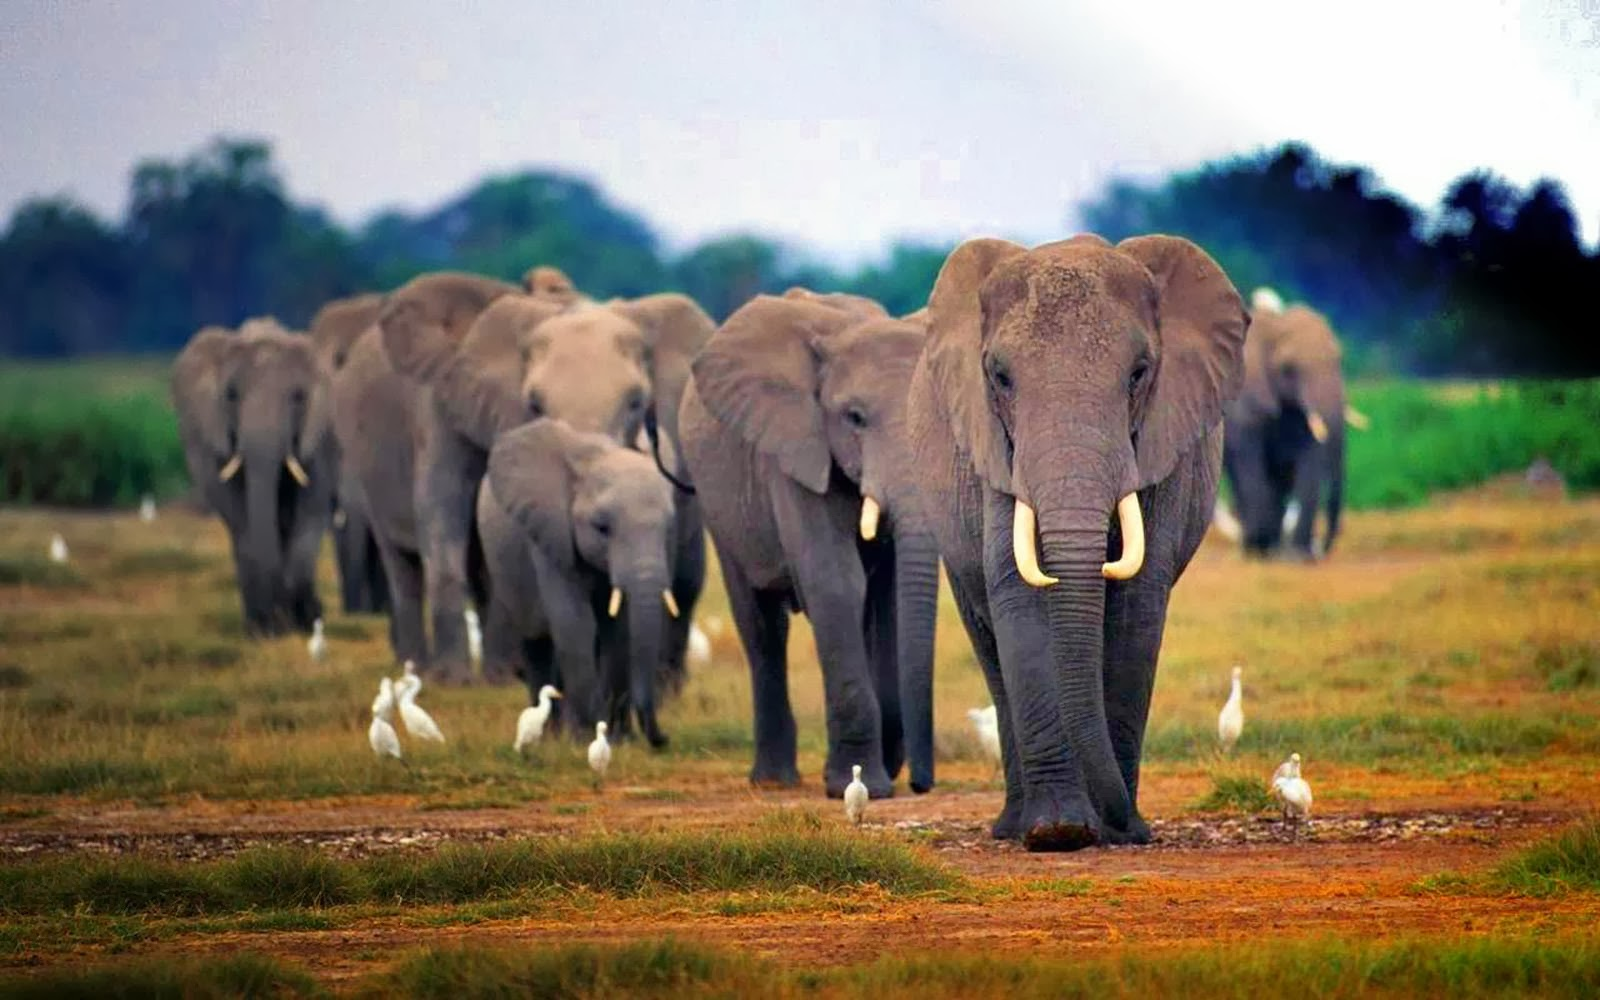 AFRICAN ELEPHANTS HD WALLPAPERS   FREE HD WALLPAPERS